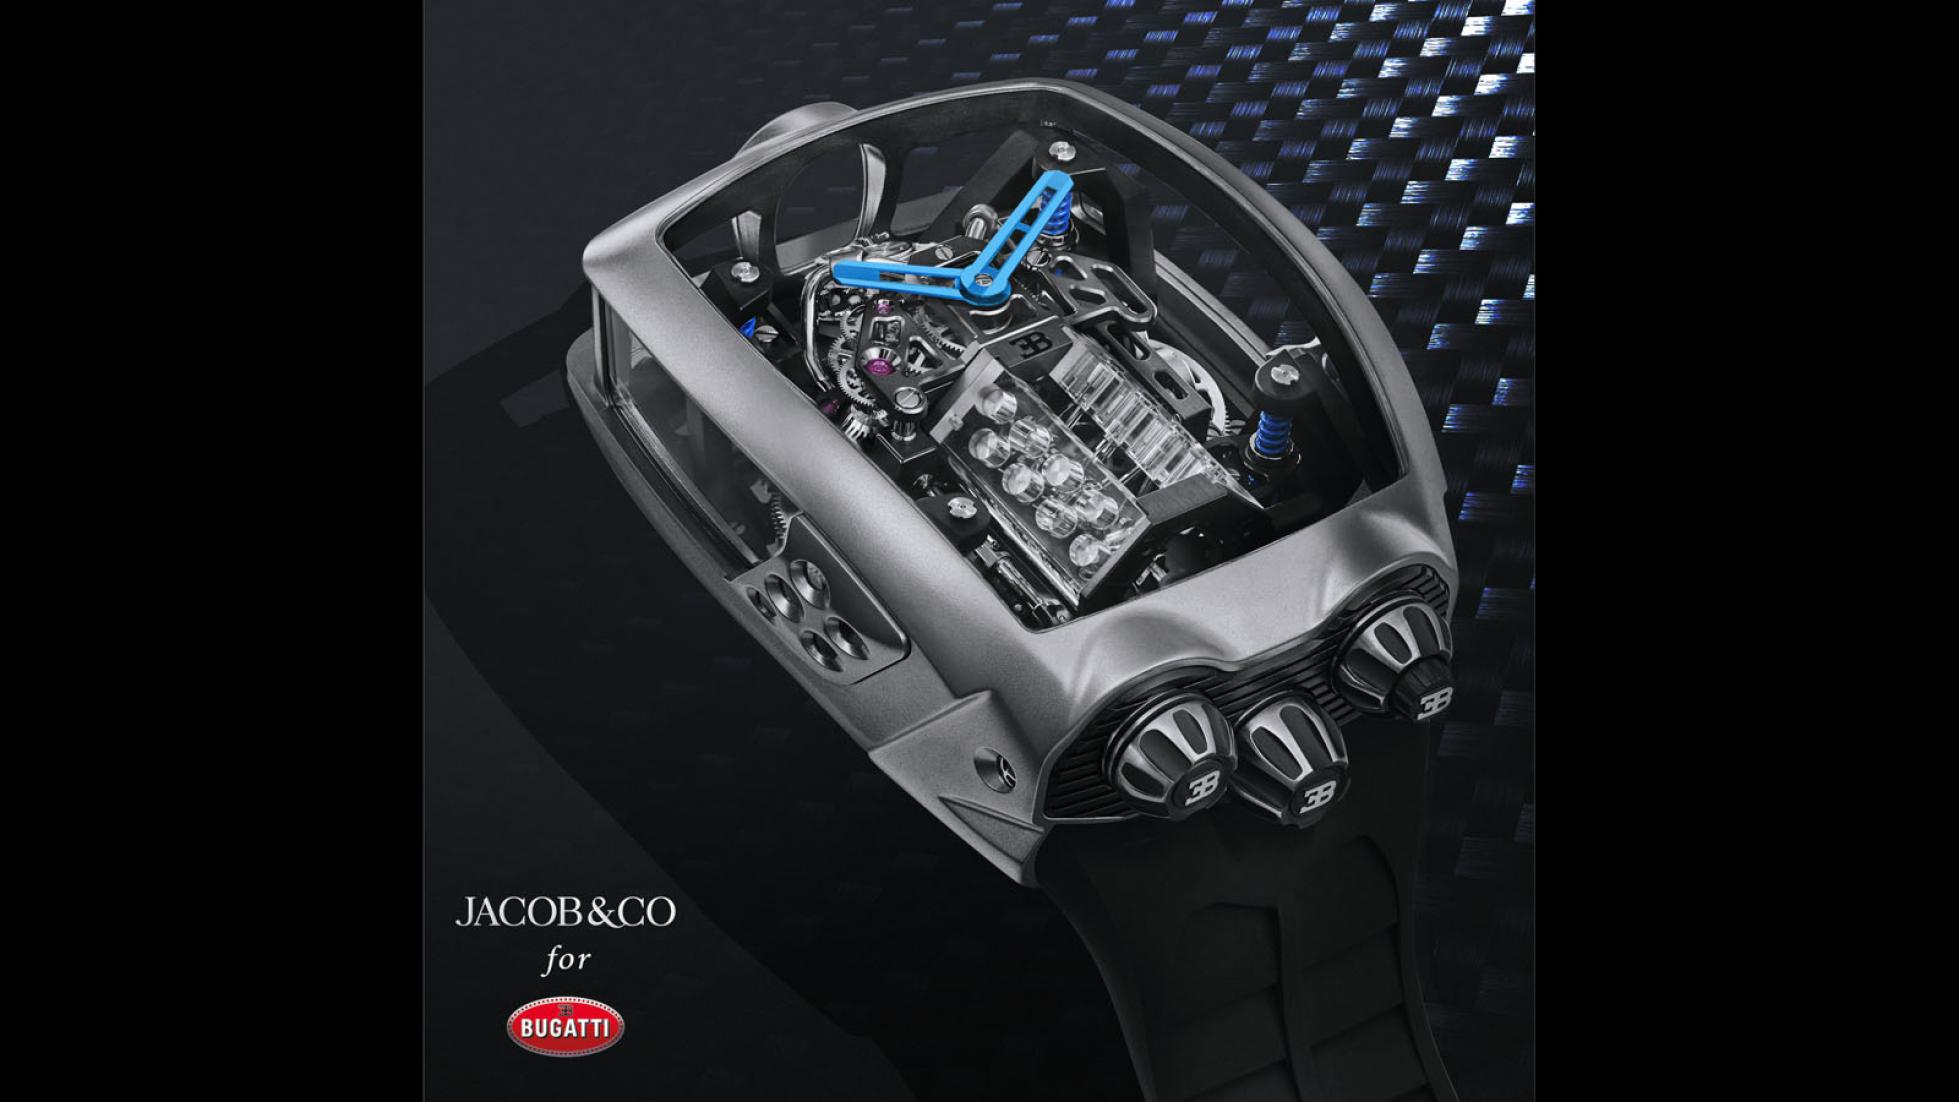 Jacob-Co-Bugatti-Chiron-Tourbillon-6